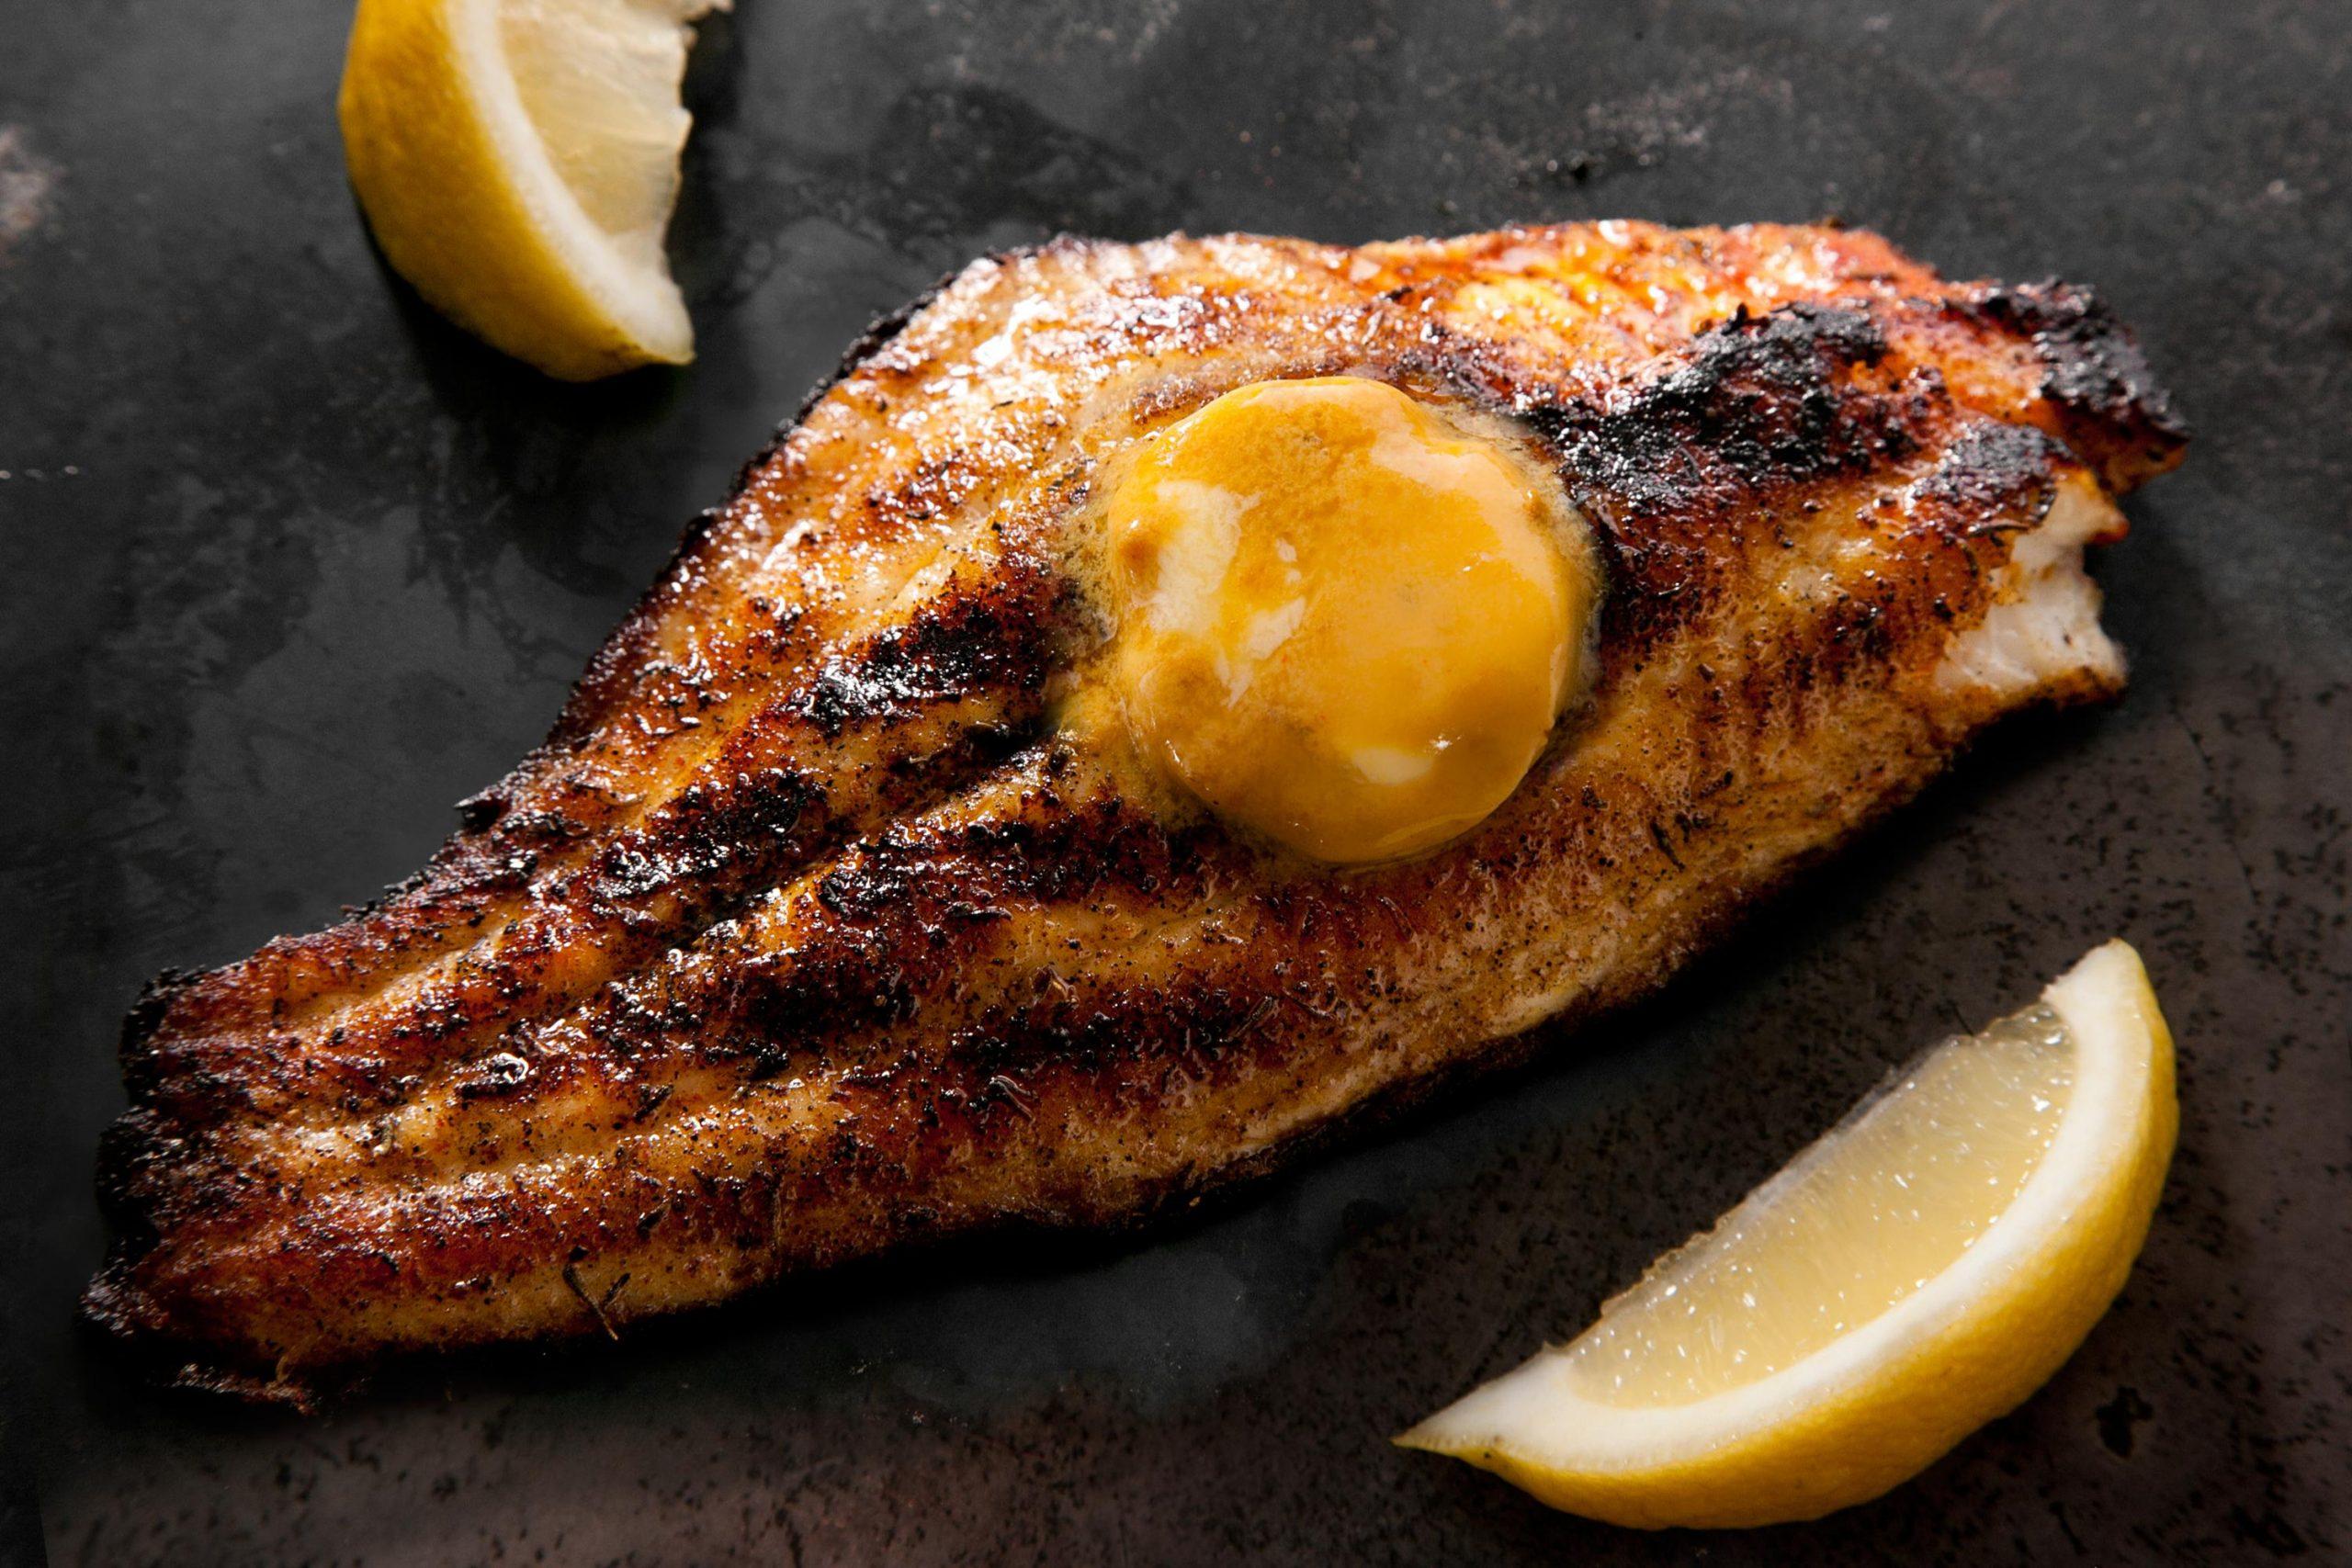 Catfish Recipes: Preparing it the Right Way!